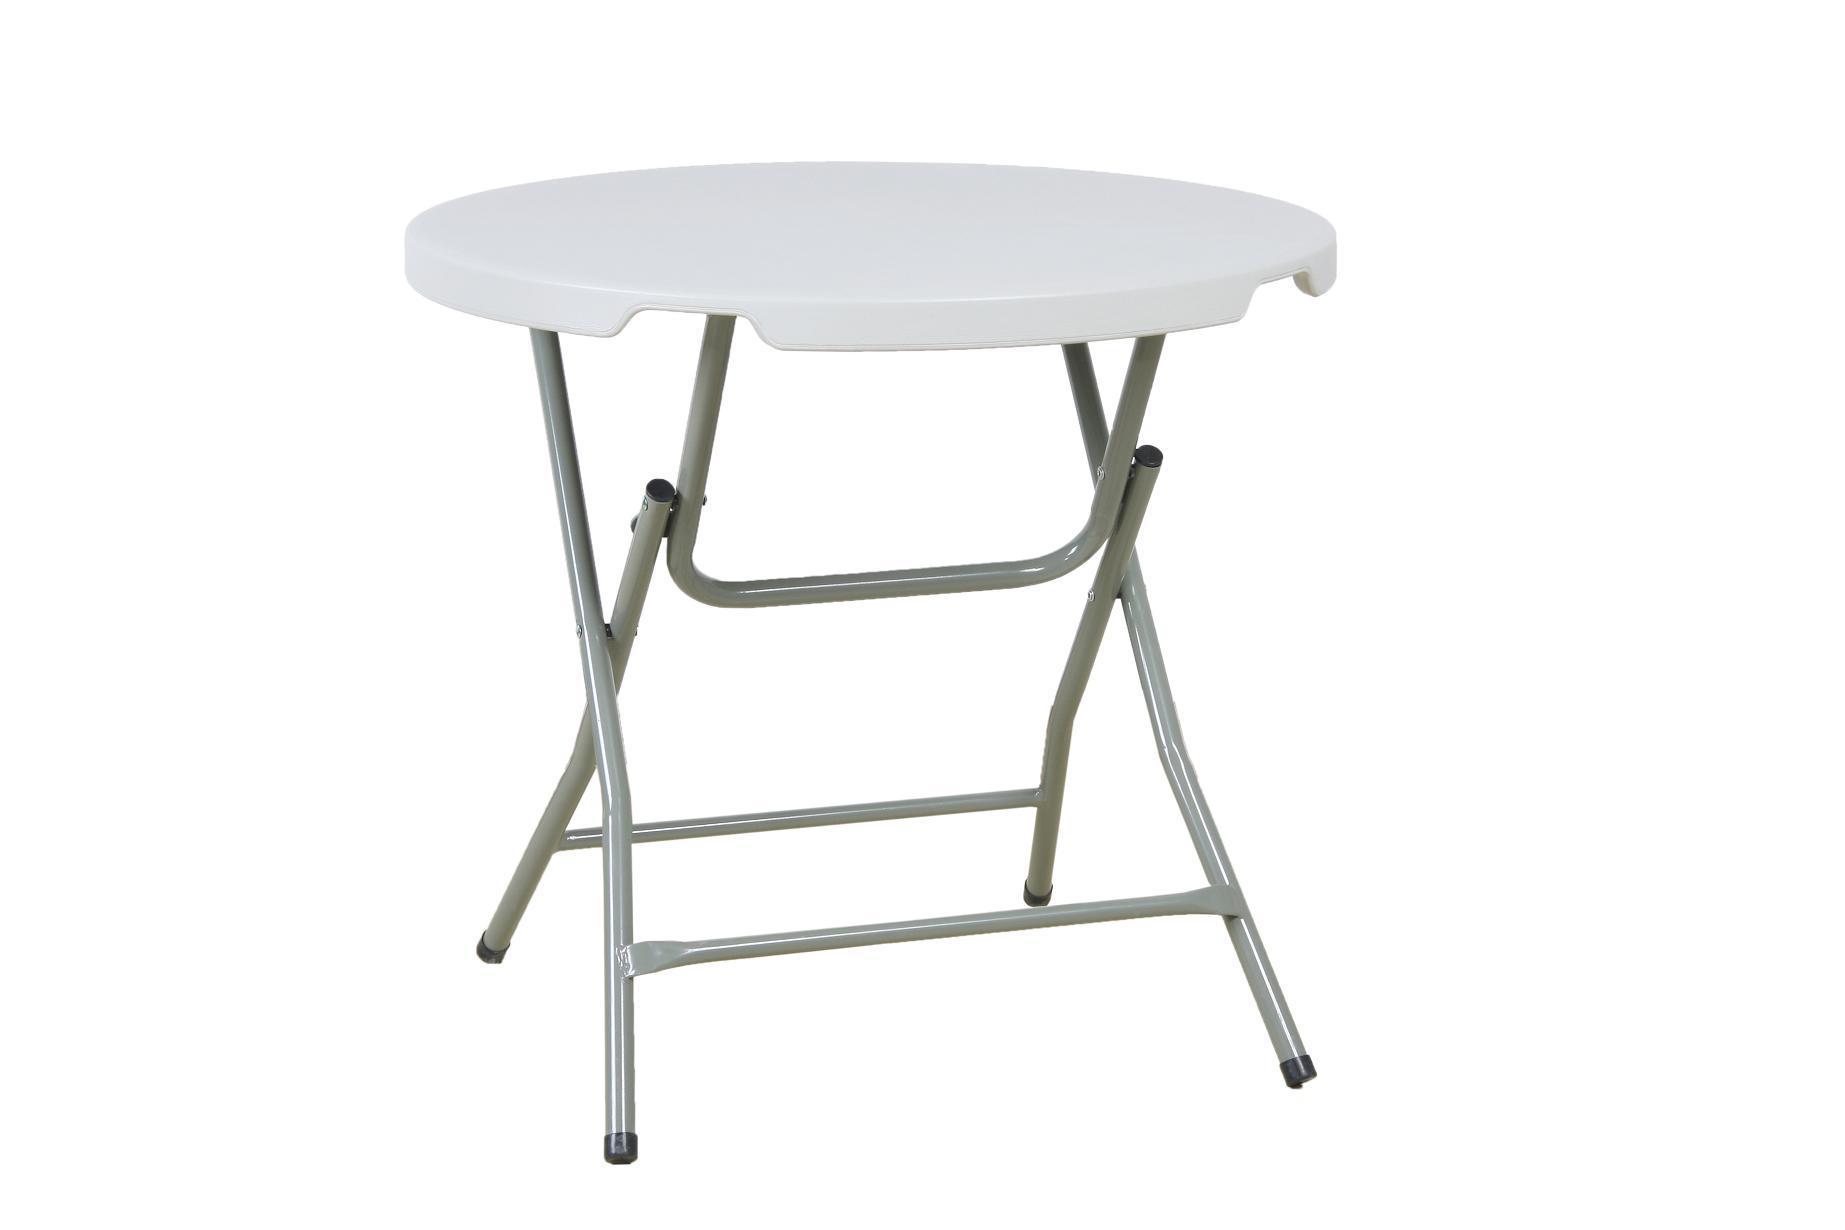 Dia 80cm Round Dining Plastic Folding Table